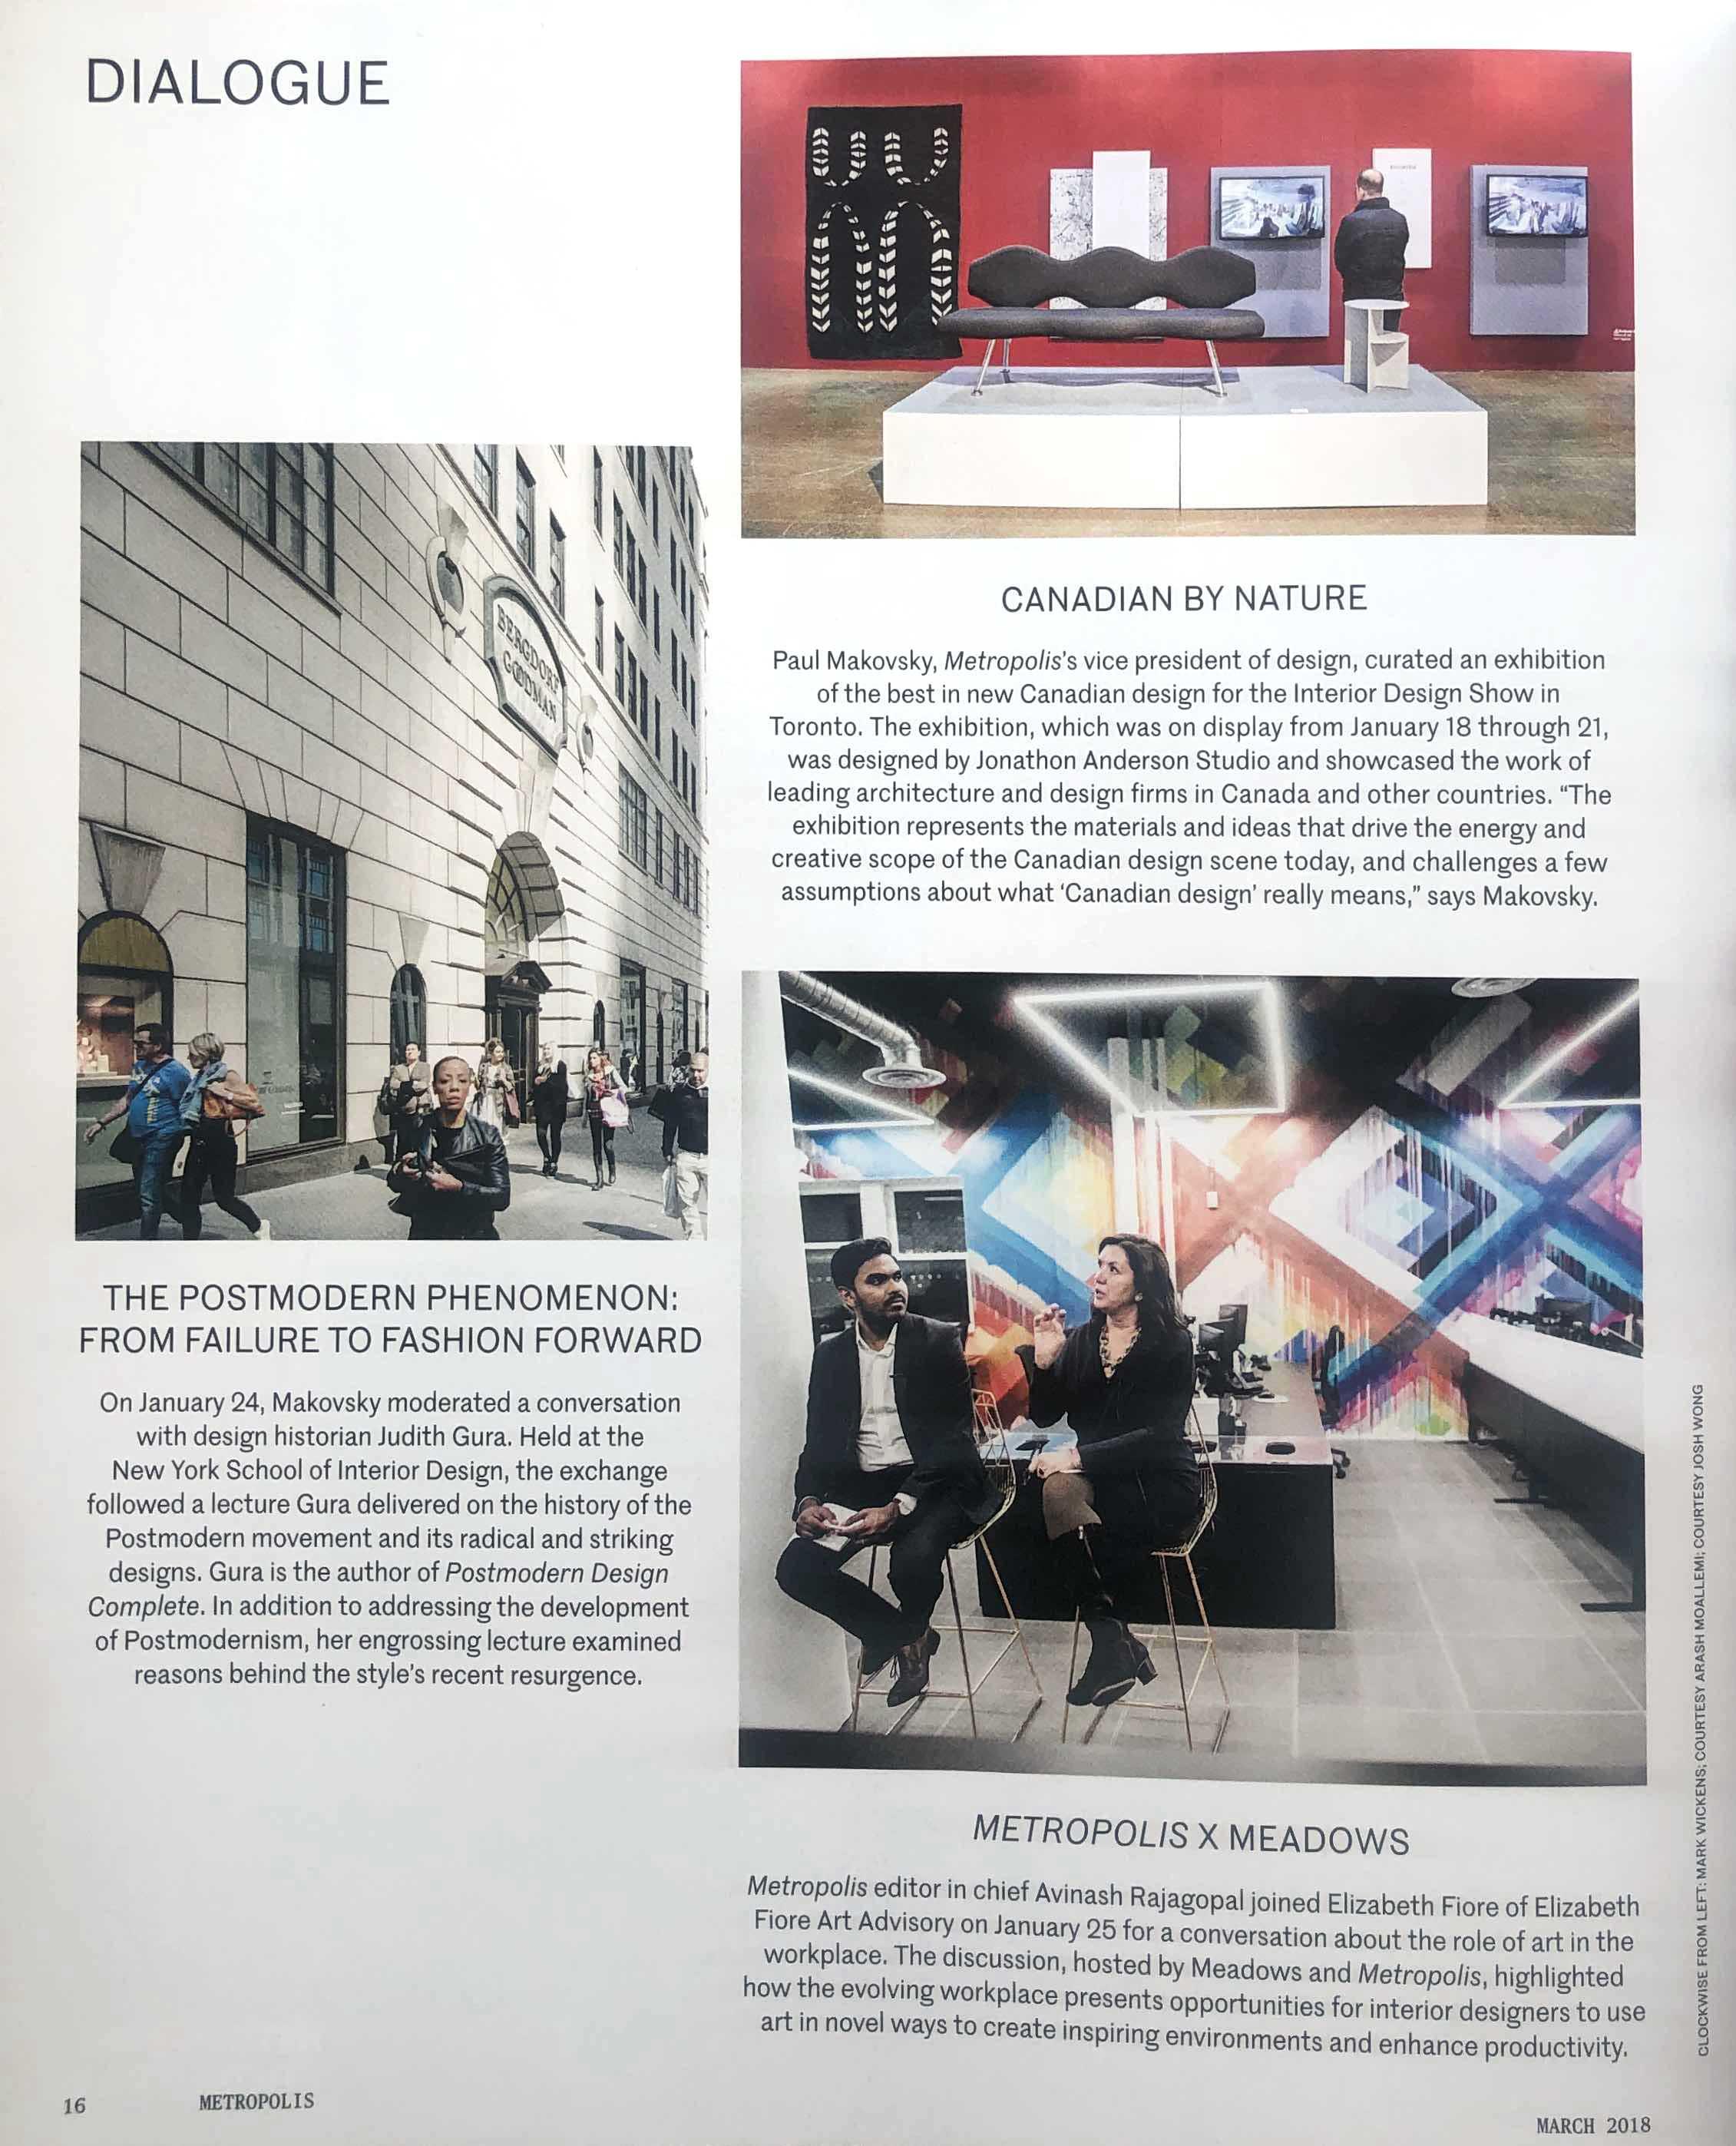 Metropolis Magazine - Elizabeth Fiore Art Advisory